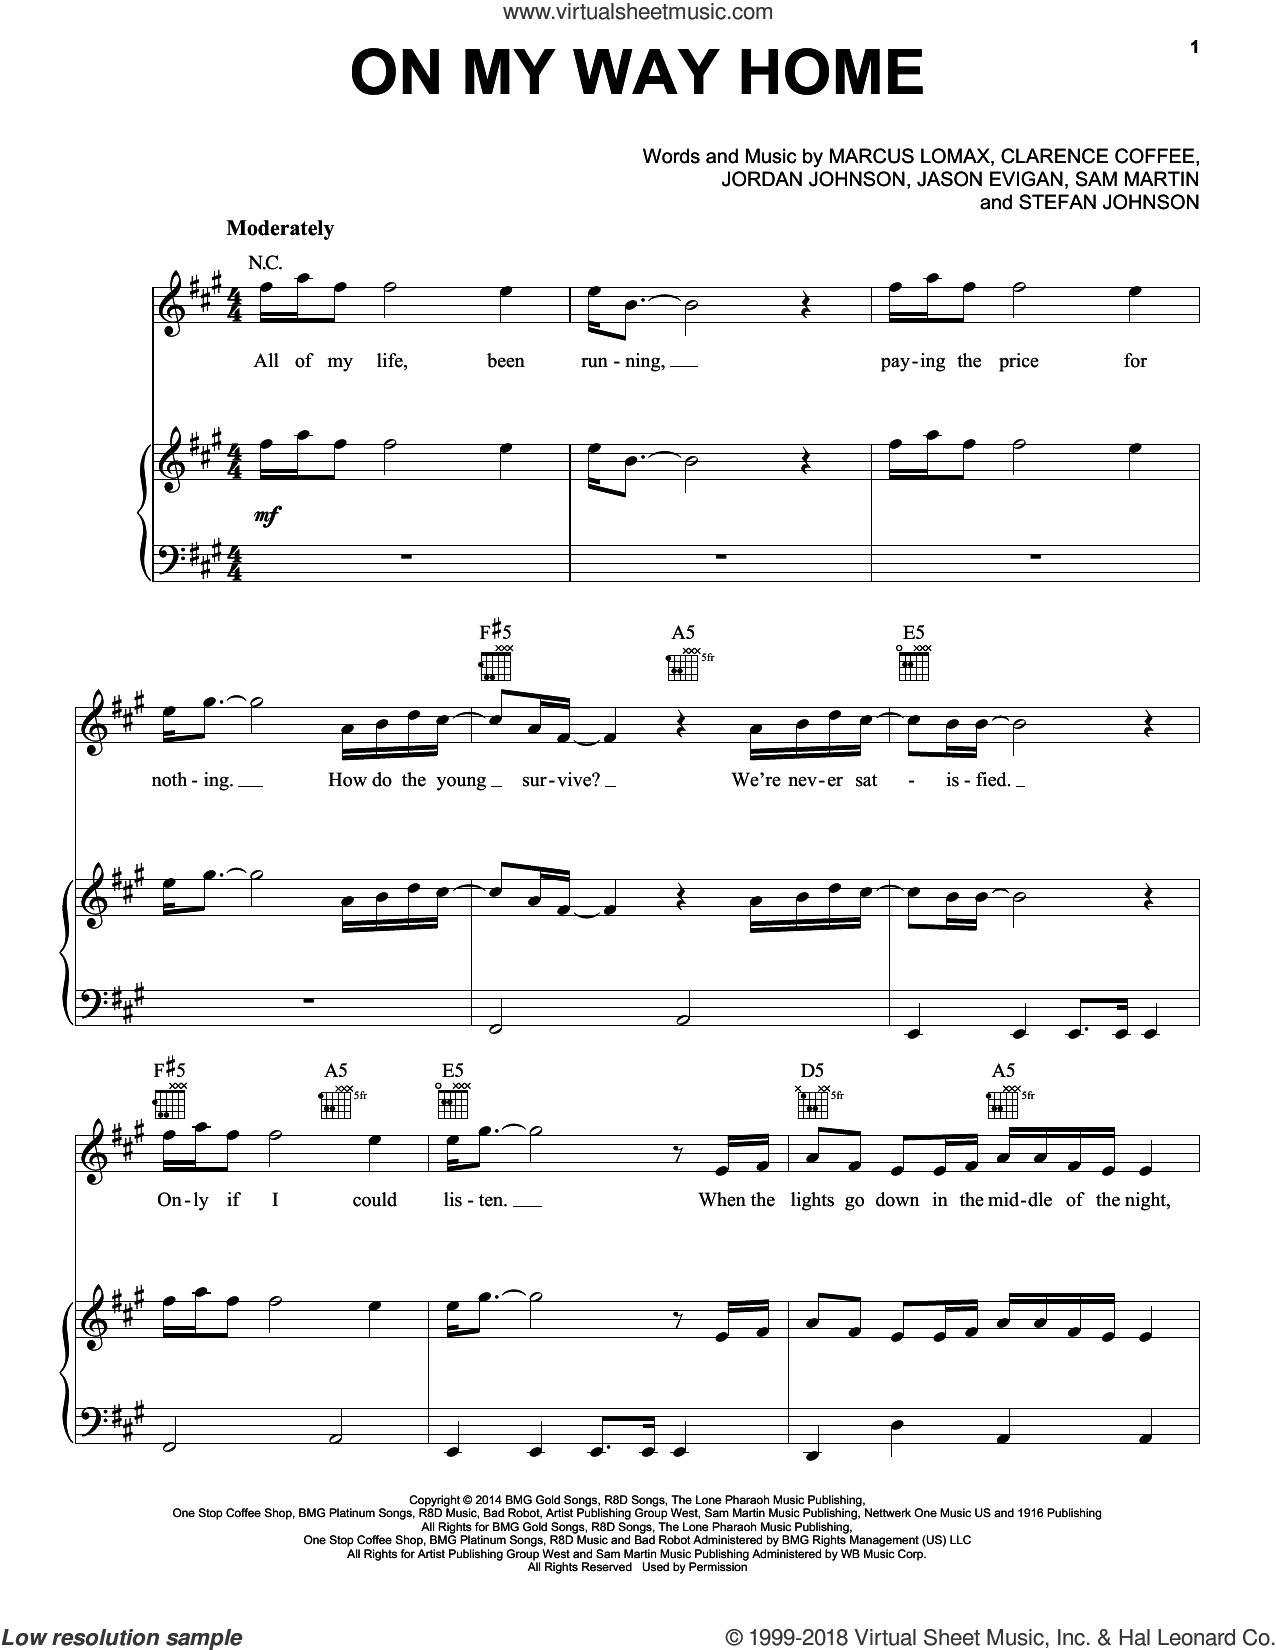 On My Way Home sheet music for voice, piano or guitar by Pentatonix, Clarence Coffee, Jason Evigan, Jordan Johnson, Marcus Lomax, Sam Martin and Stefan Johnson, intermediate skill level